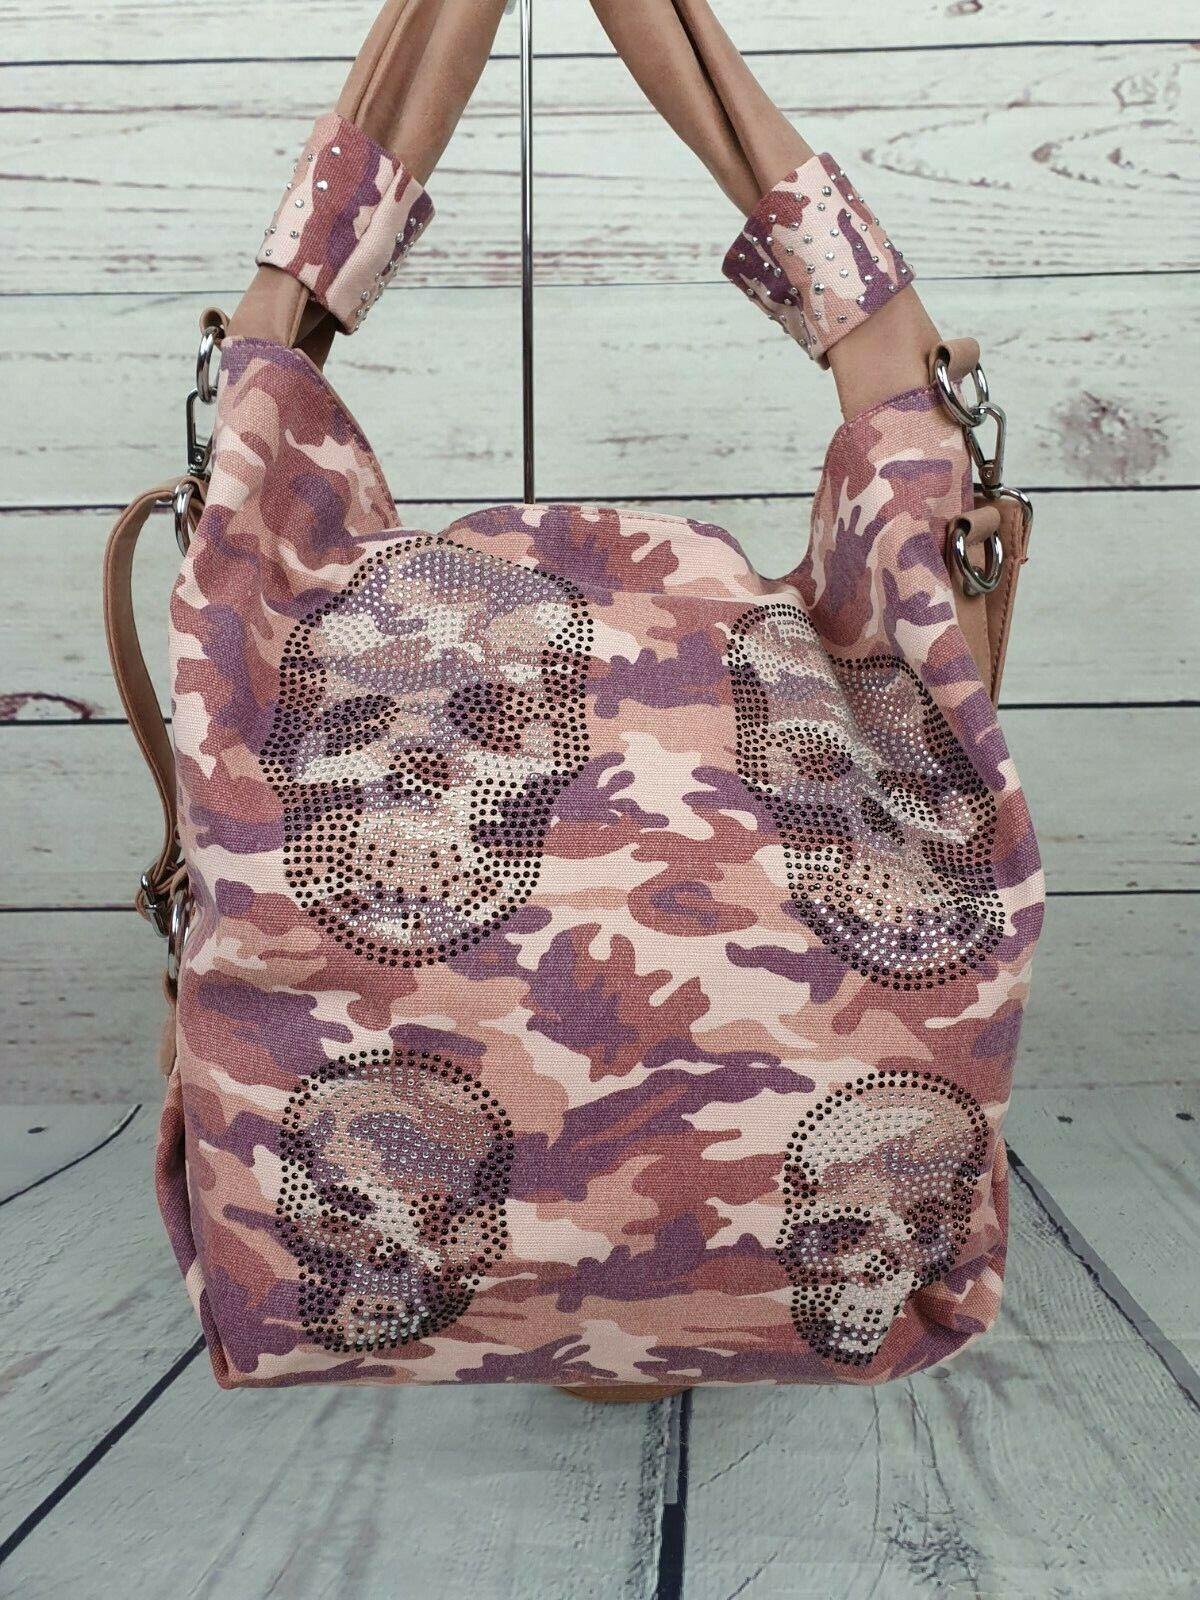 Damen Handtasche Totenkopf Skull Blogger Bag Tasche Rosa Strass Camouflage NEU